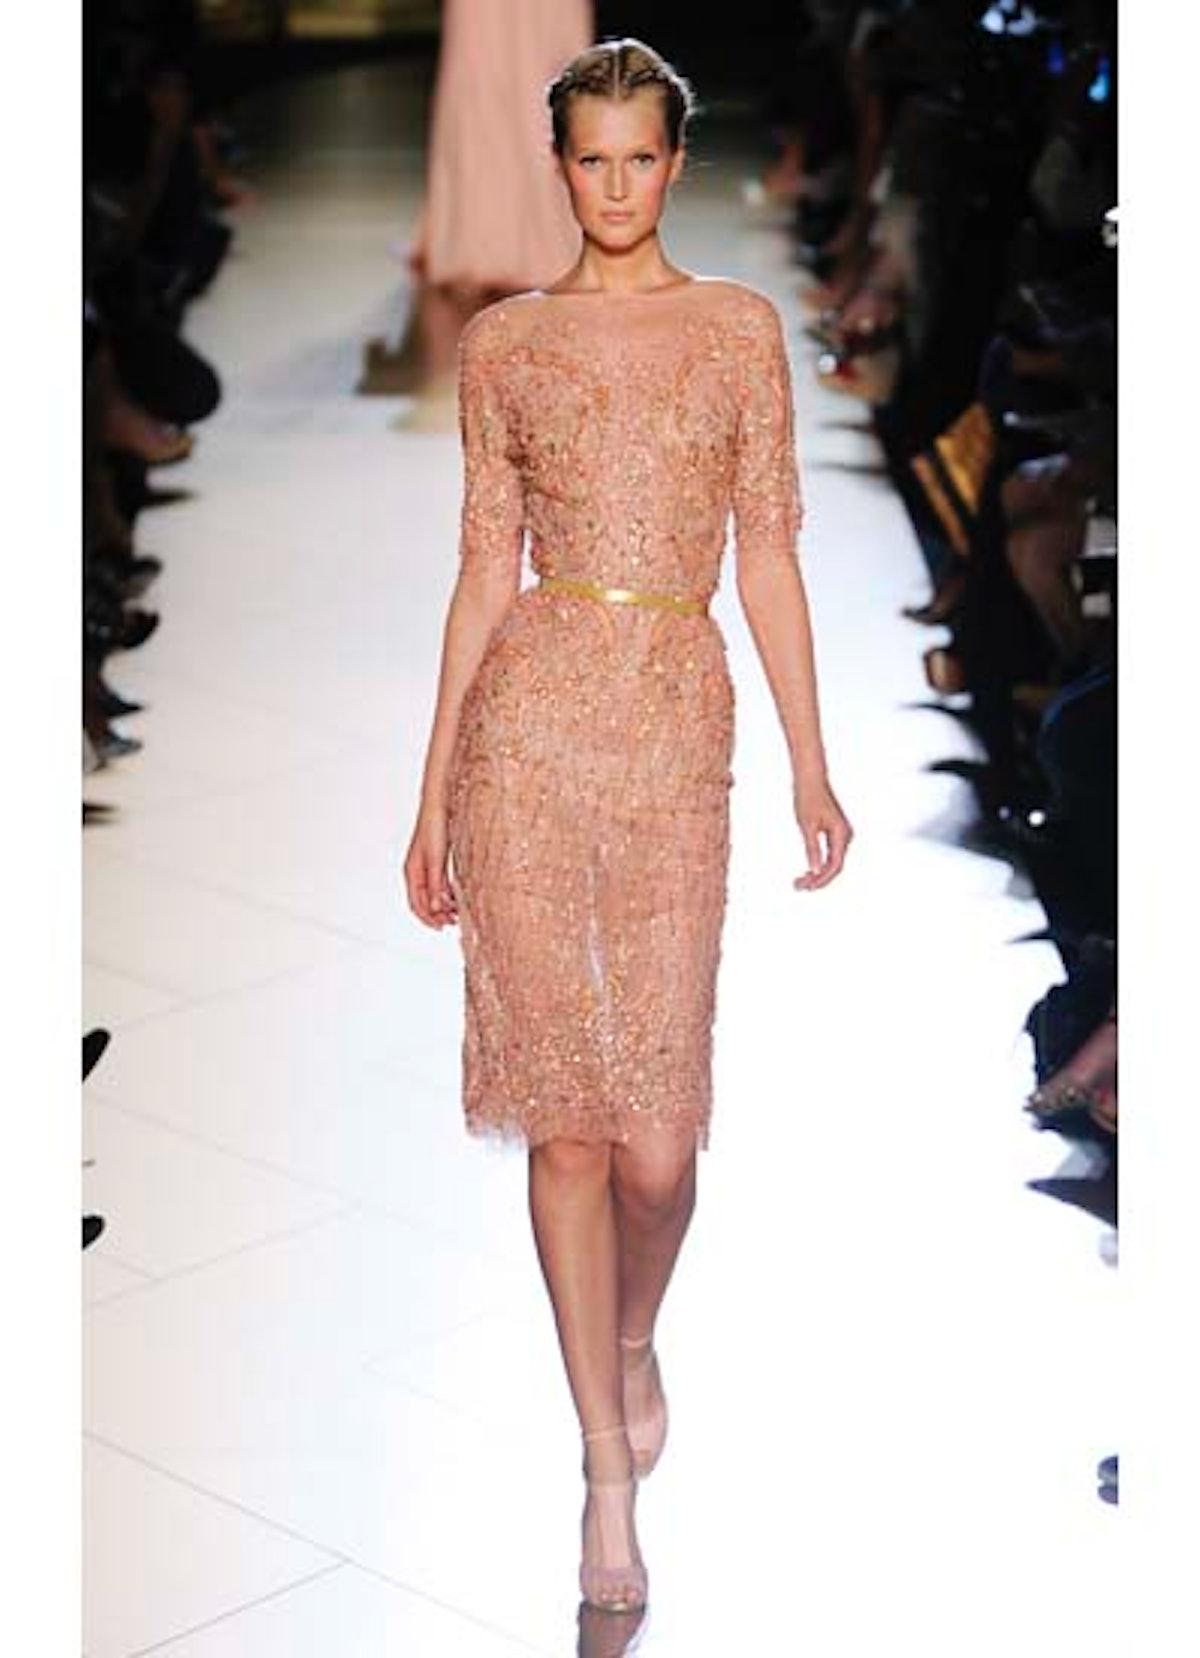 fass-elie-saab-couture-2012-runway-16-v.jpg